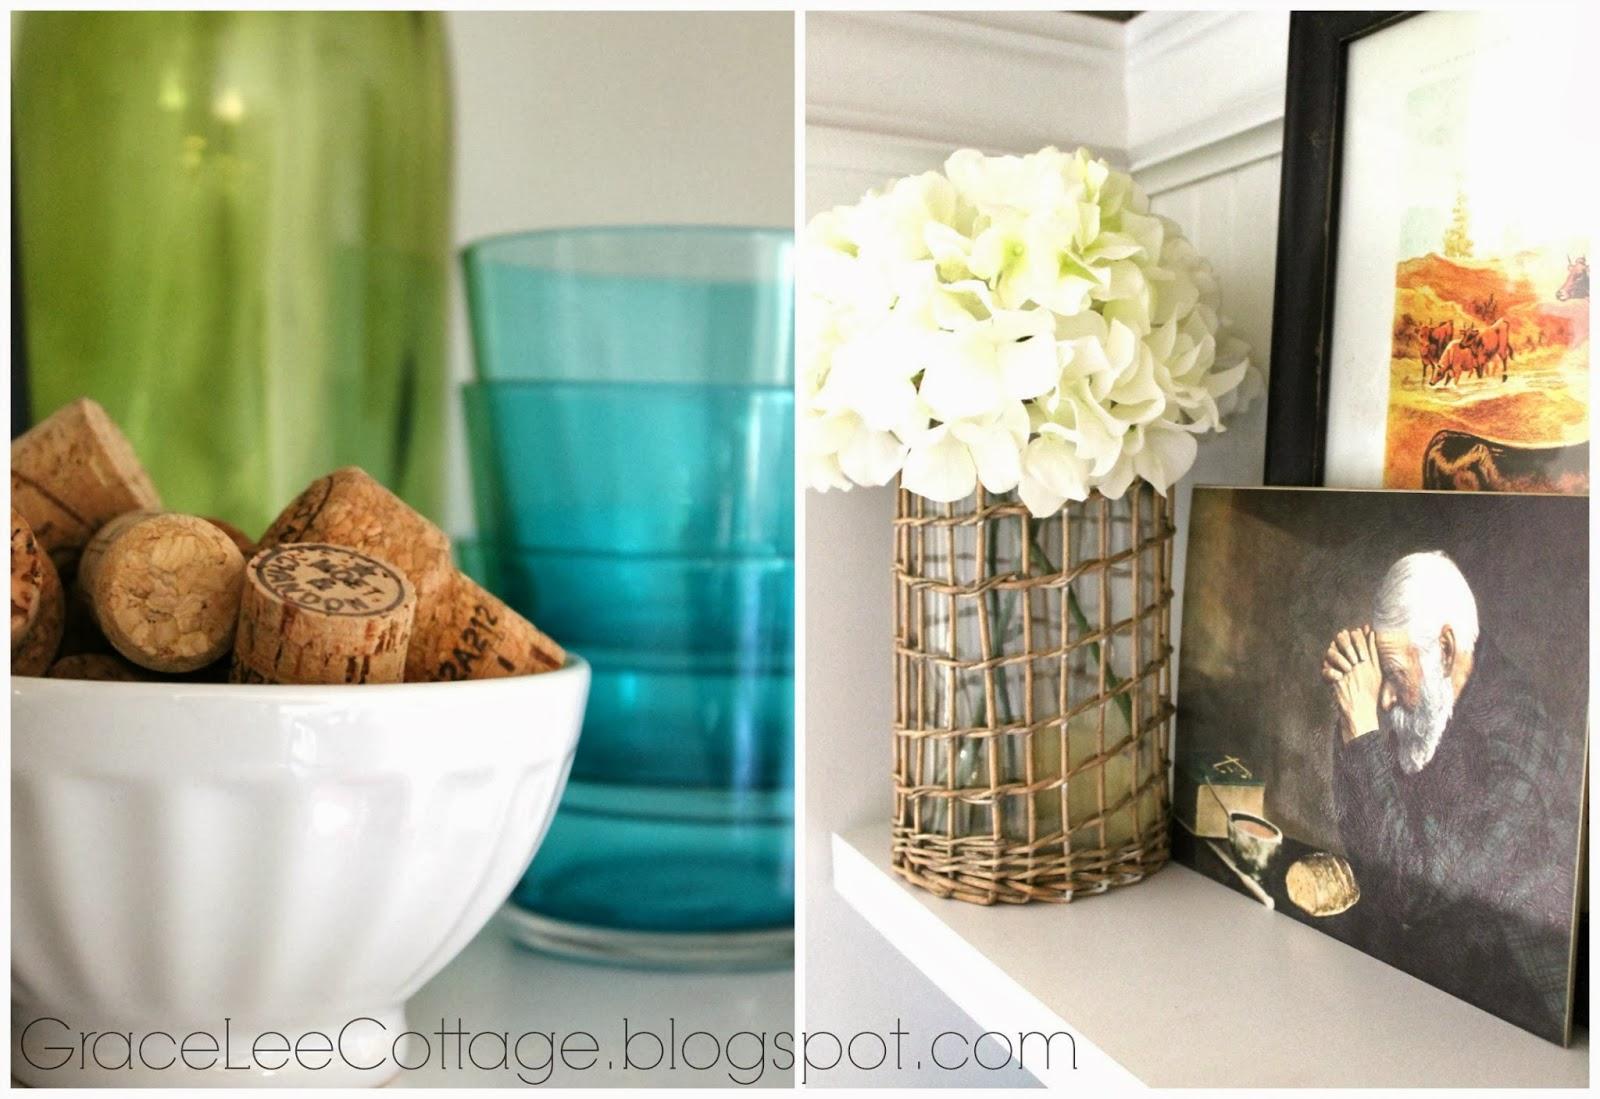 Grace Lee Cottage: Kitchen Shelf Styling {Winter Edition}